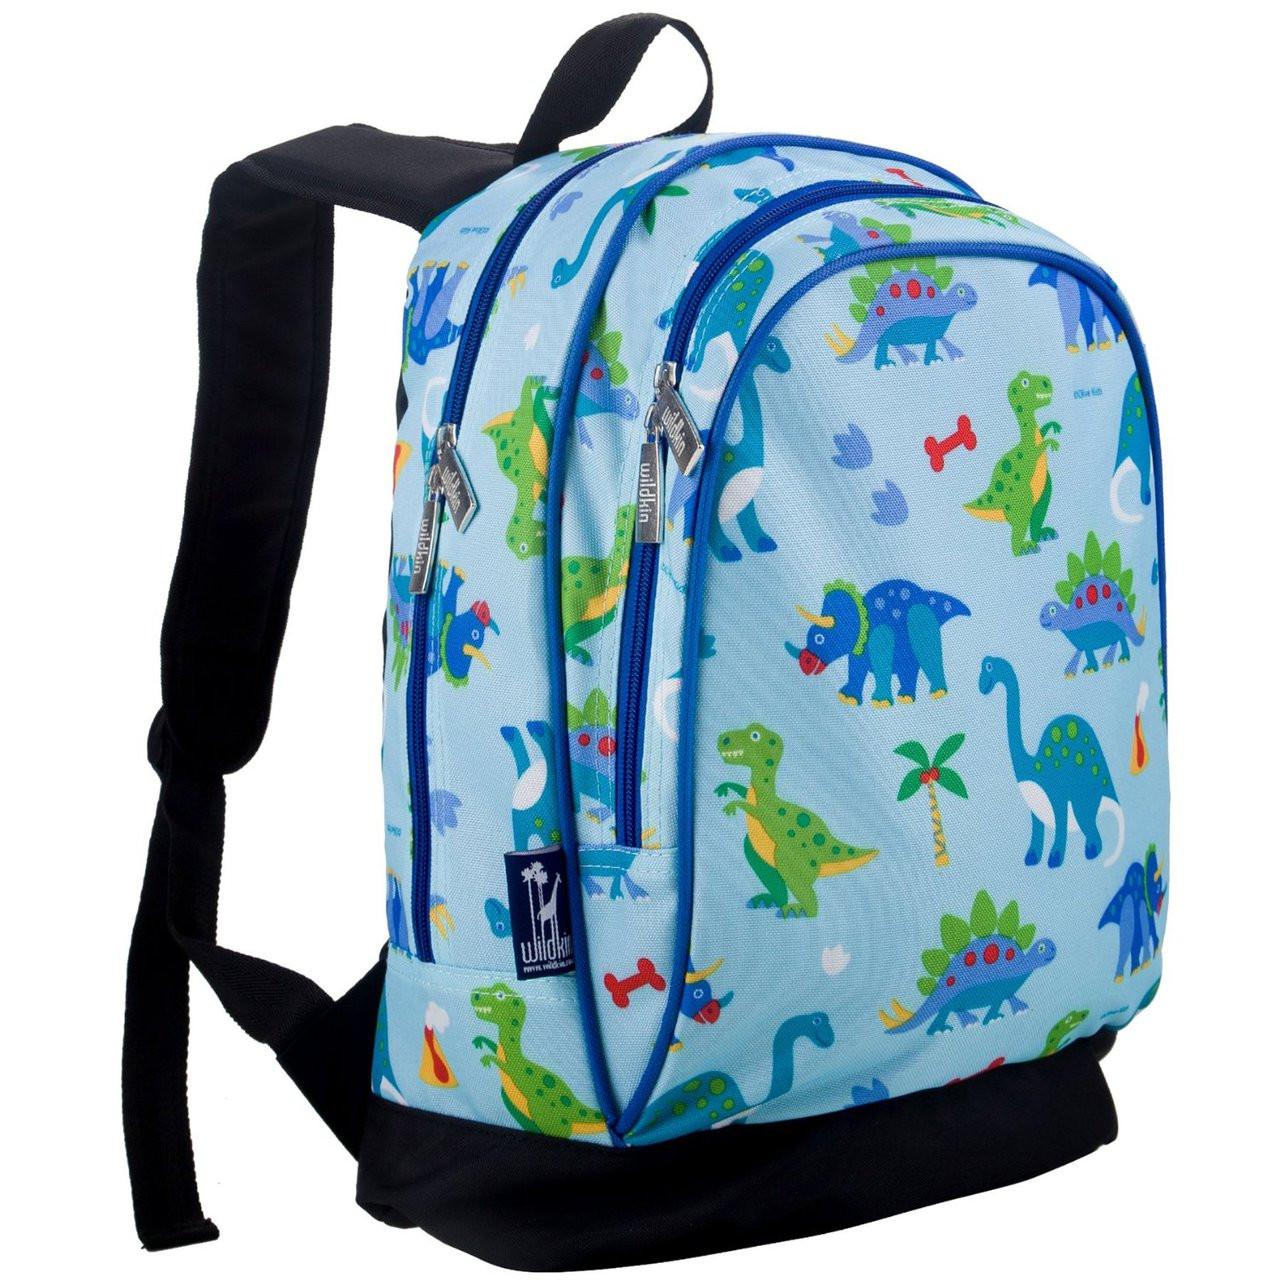 31bba792f104 Wildkin Kids Backpack - Dinosaur Land